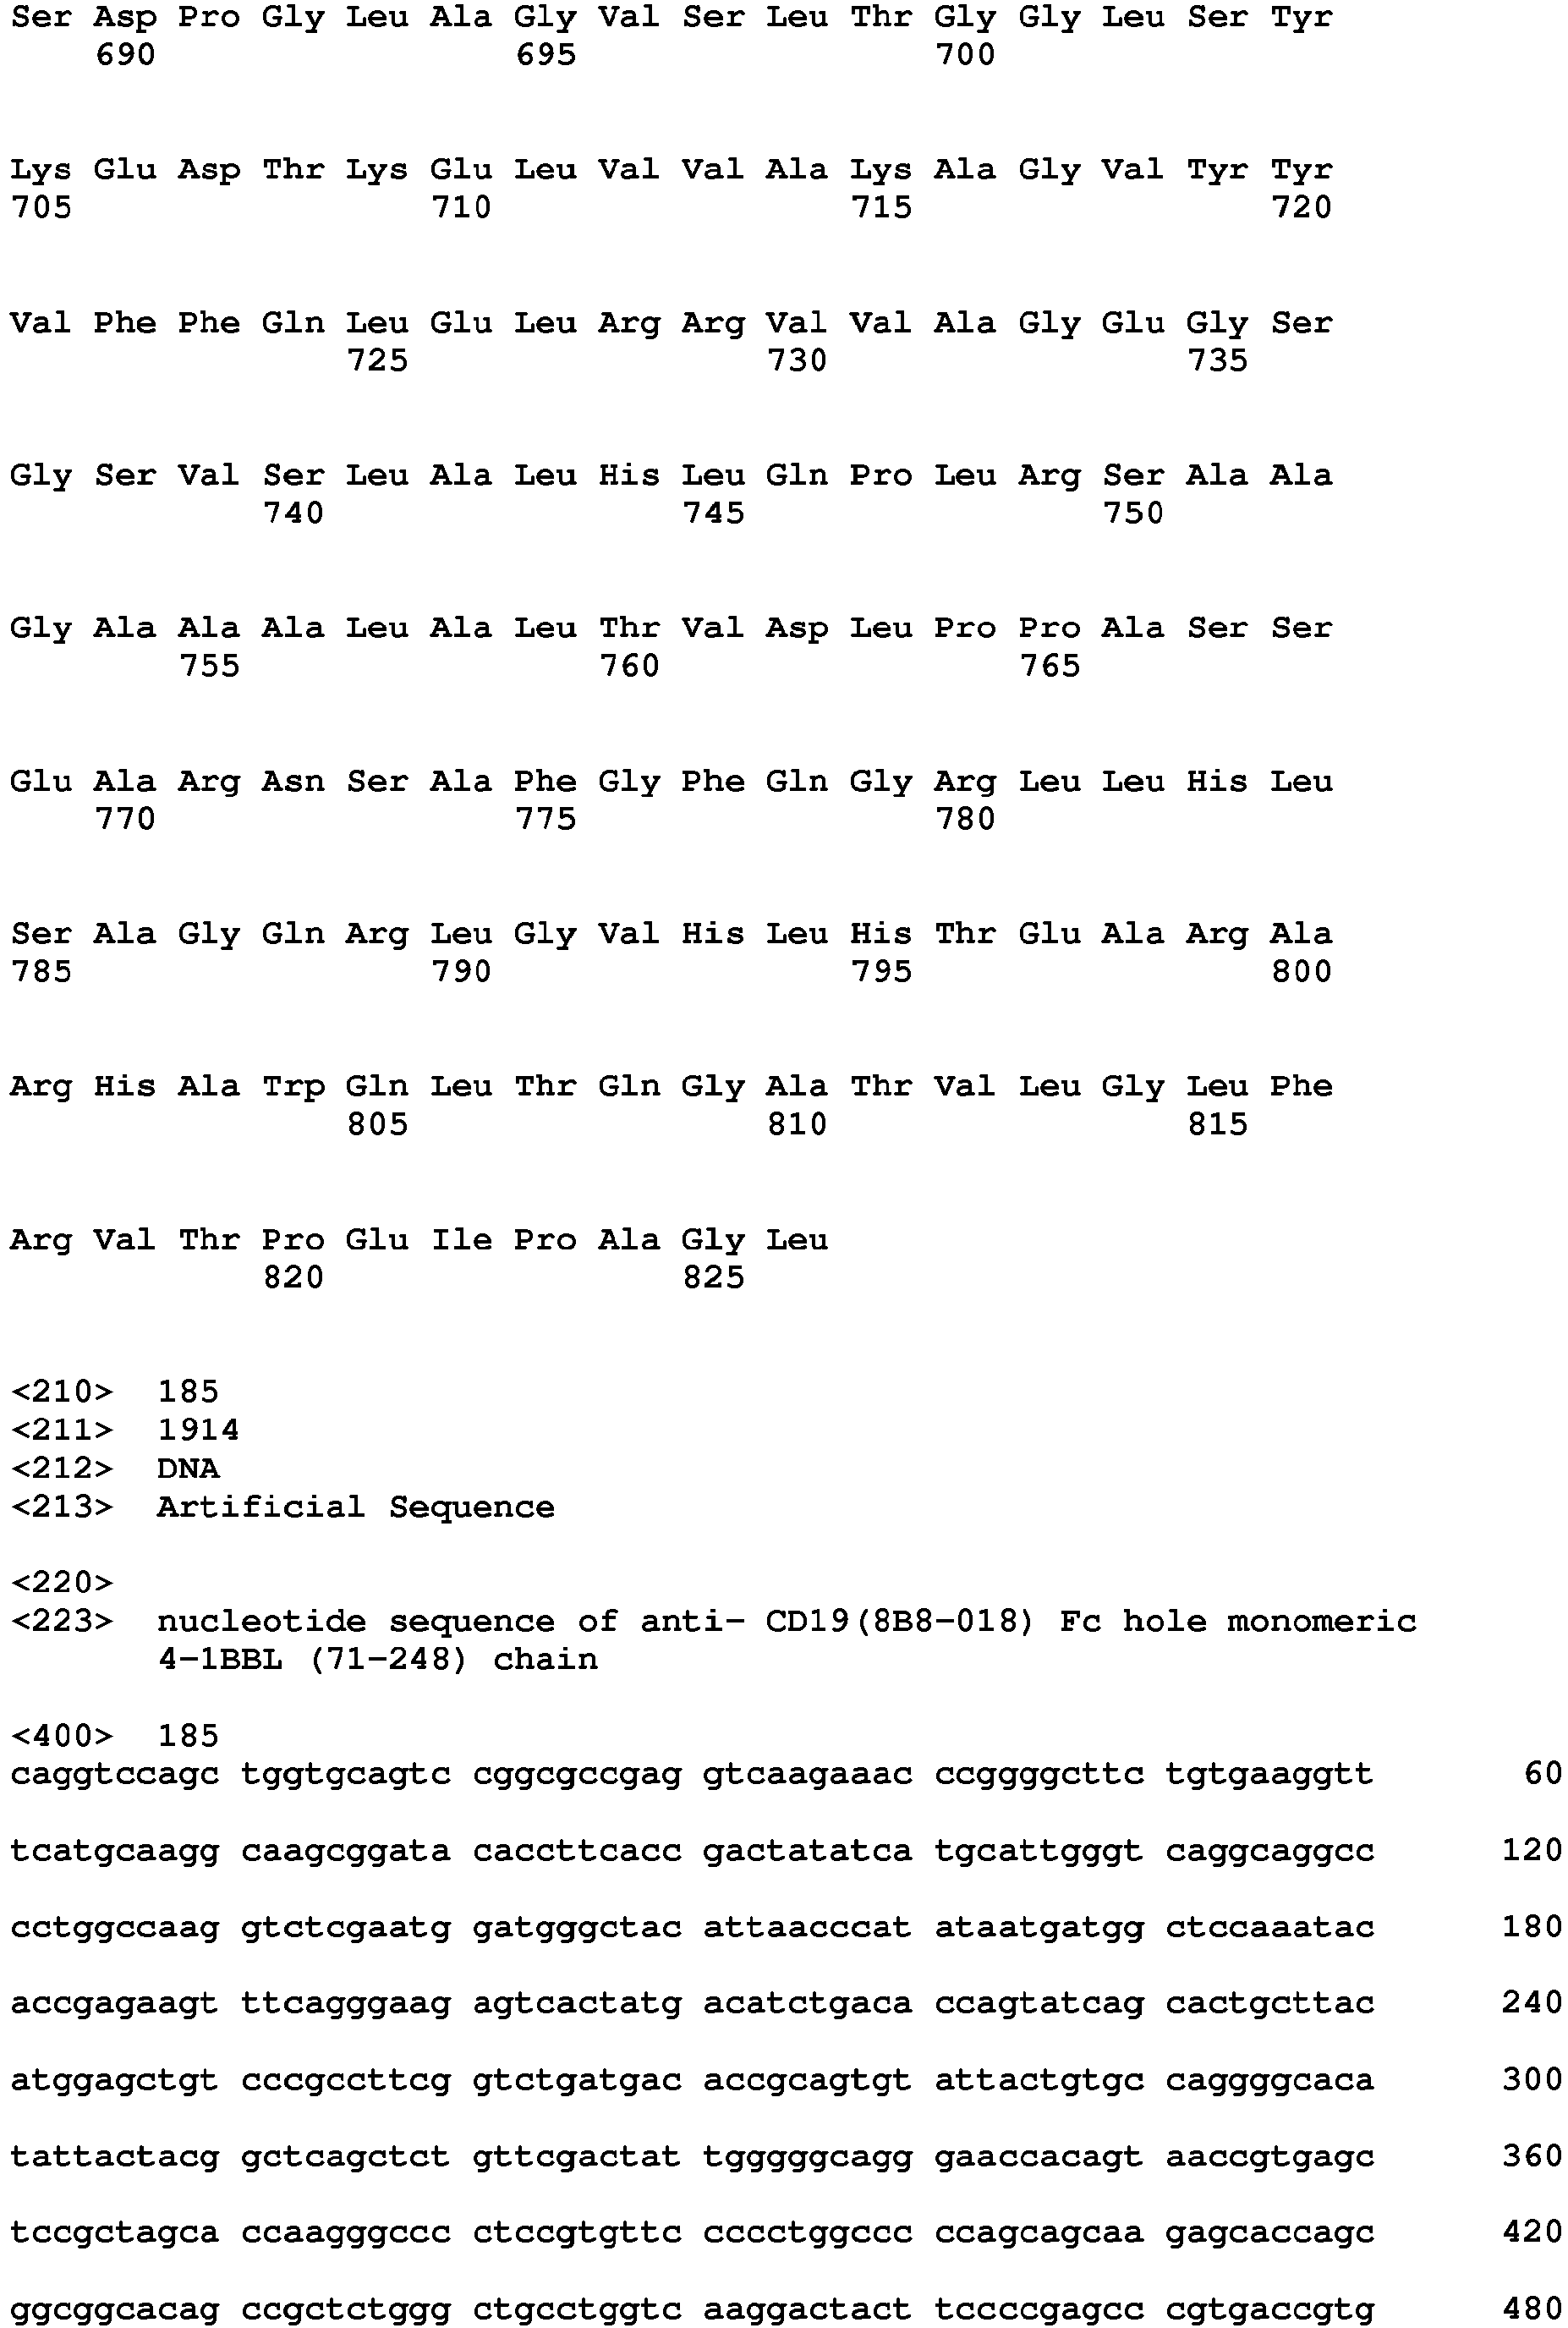 Figure imgb0466